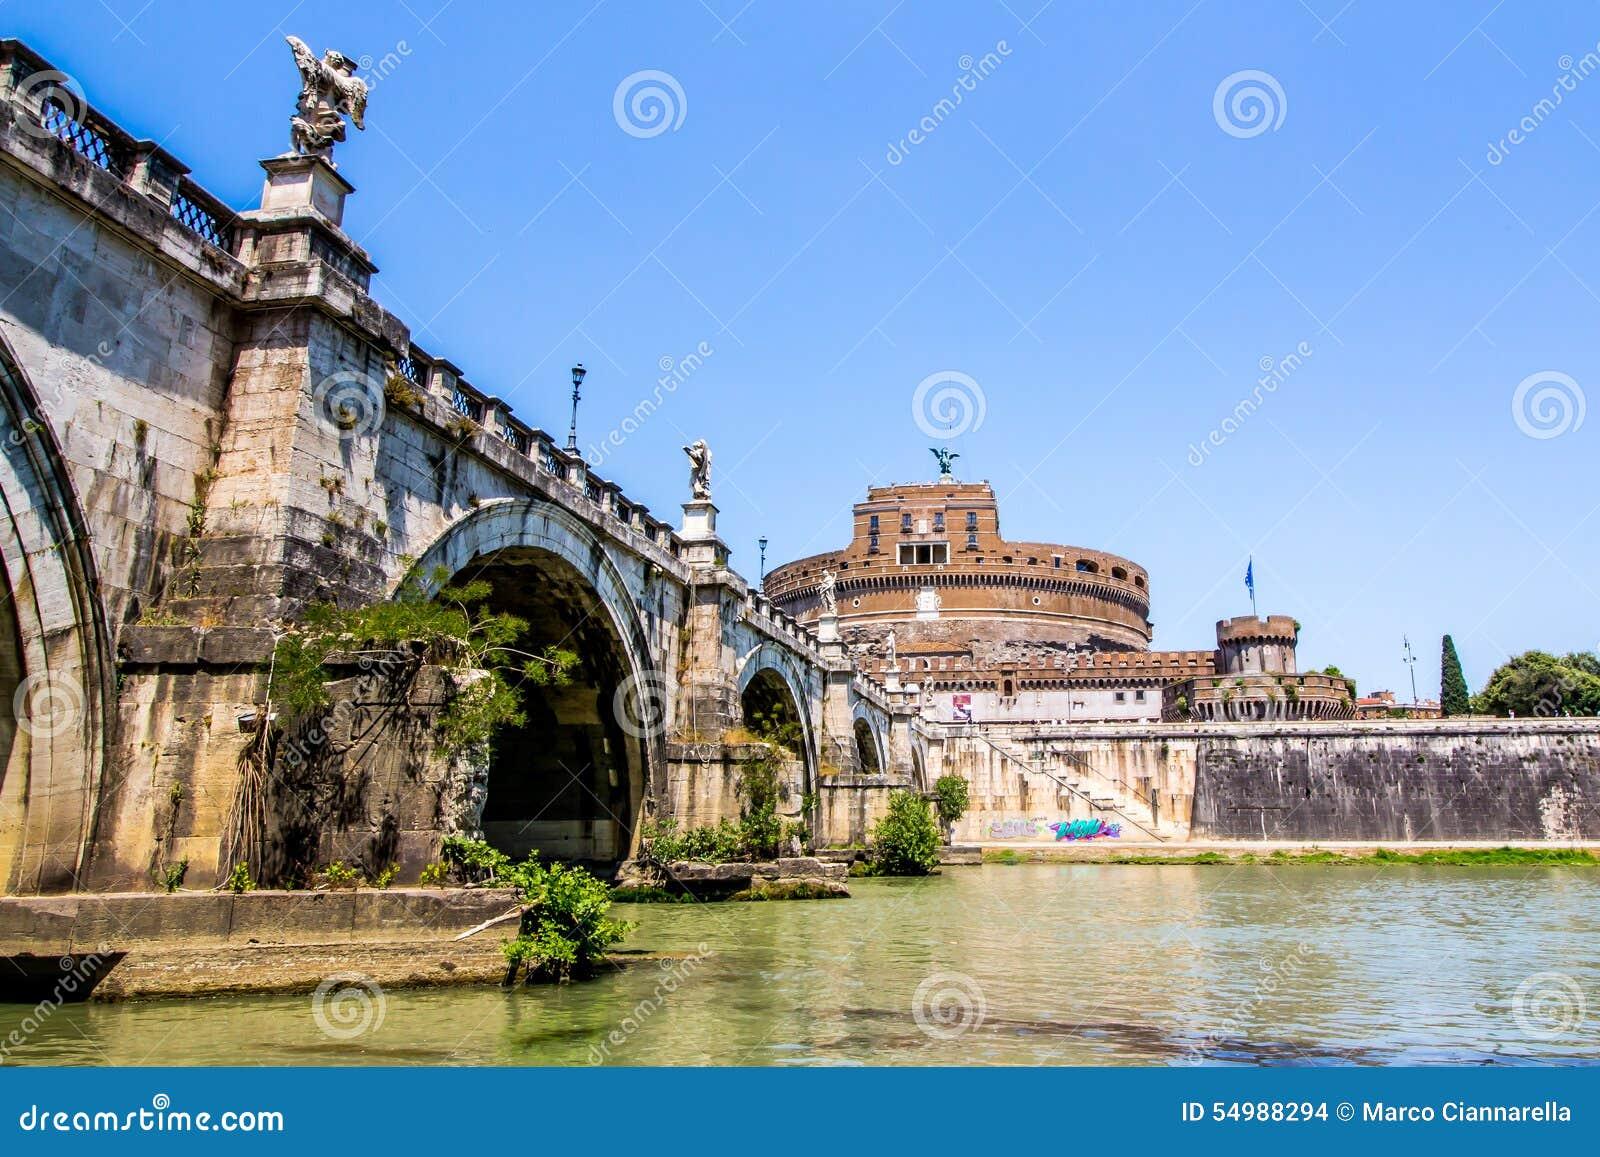 Sikt av Castel Sant   Angelo från under bron, Rome, Italien